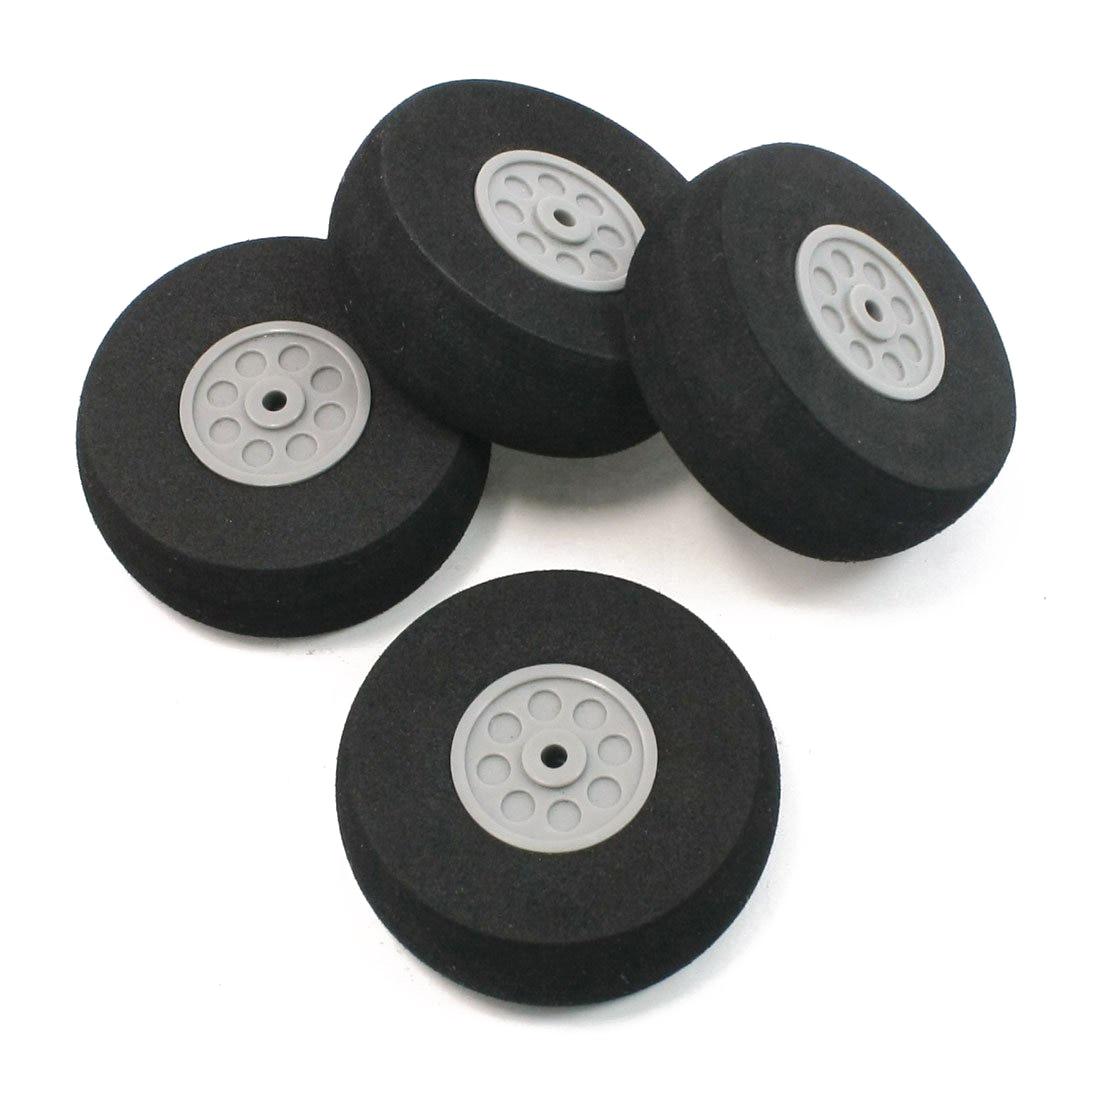 4 Pcs Gray Plastic Hub Black Foam Wheel 55mm Dia for RC Aircraft Model Toy игрушка ecx ruckus gray blue ecx00013t1